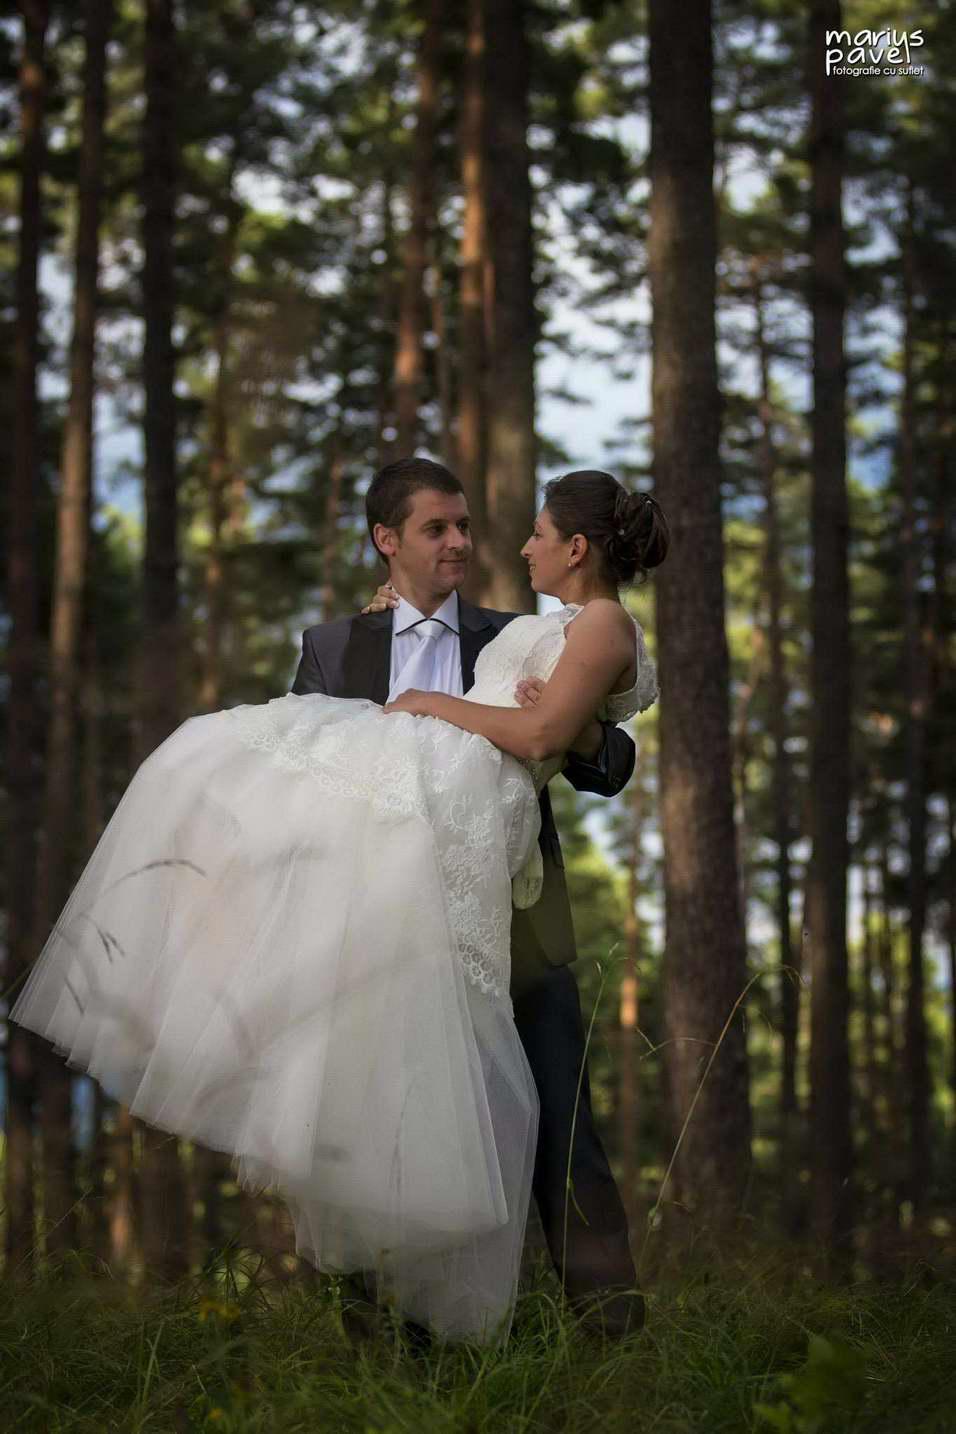 Sedinta foto dupa nunta - Trash the dress - Brasov